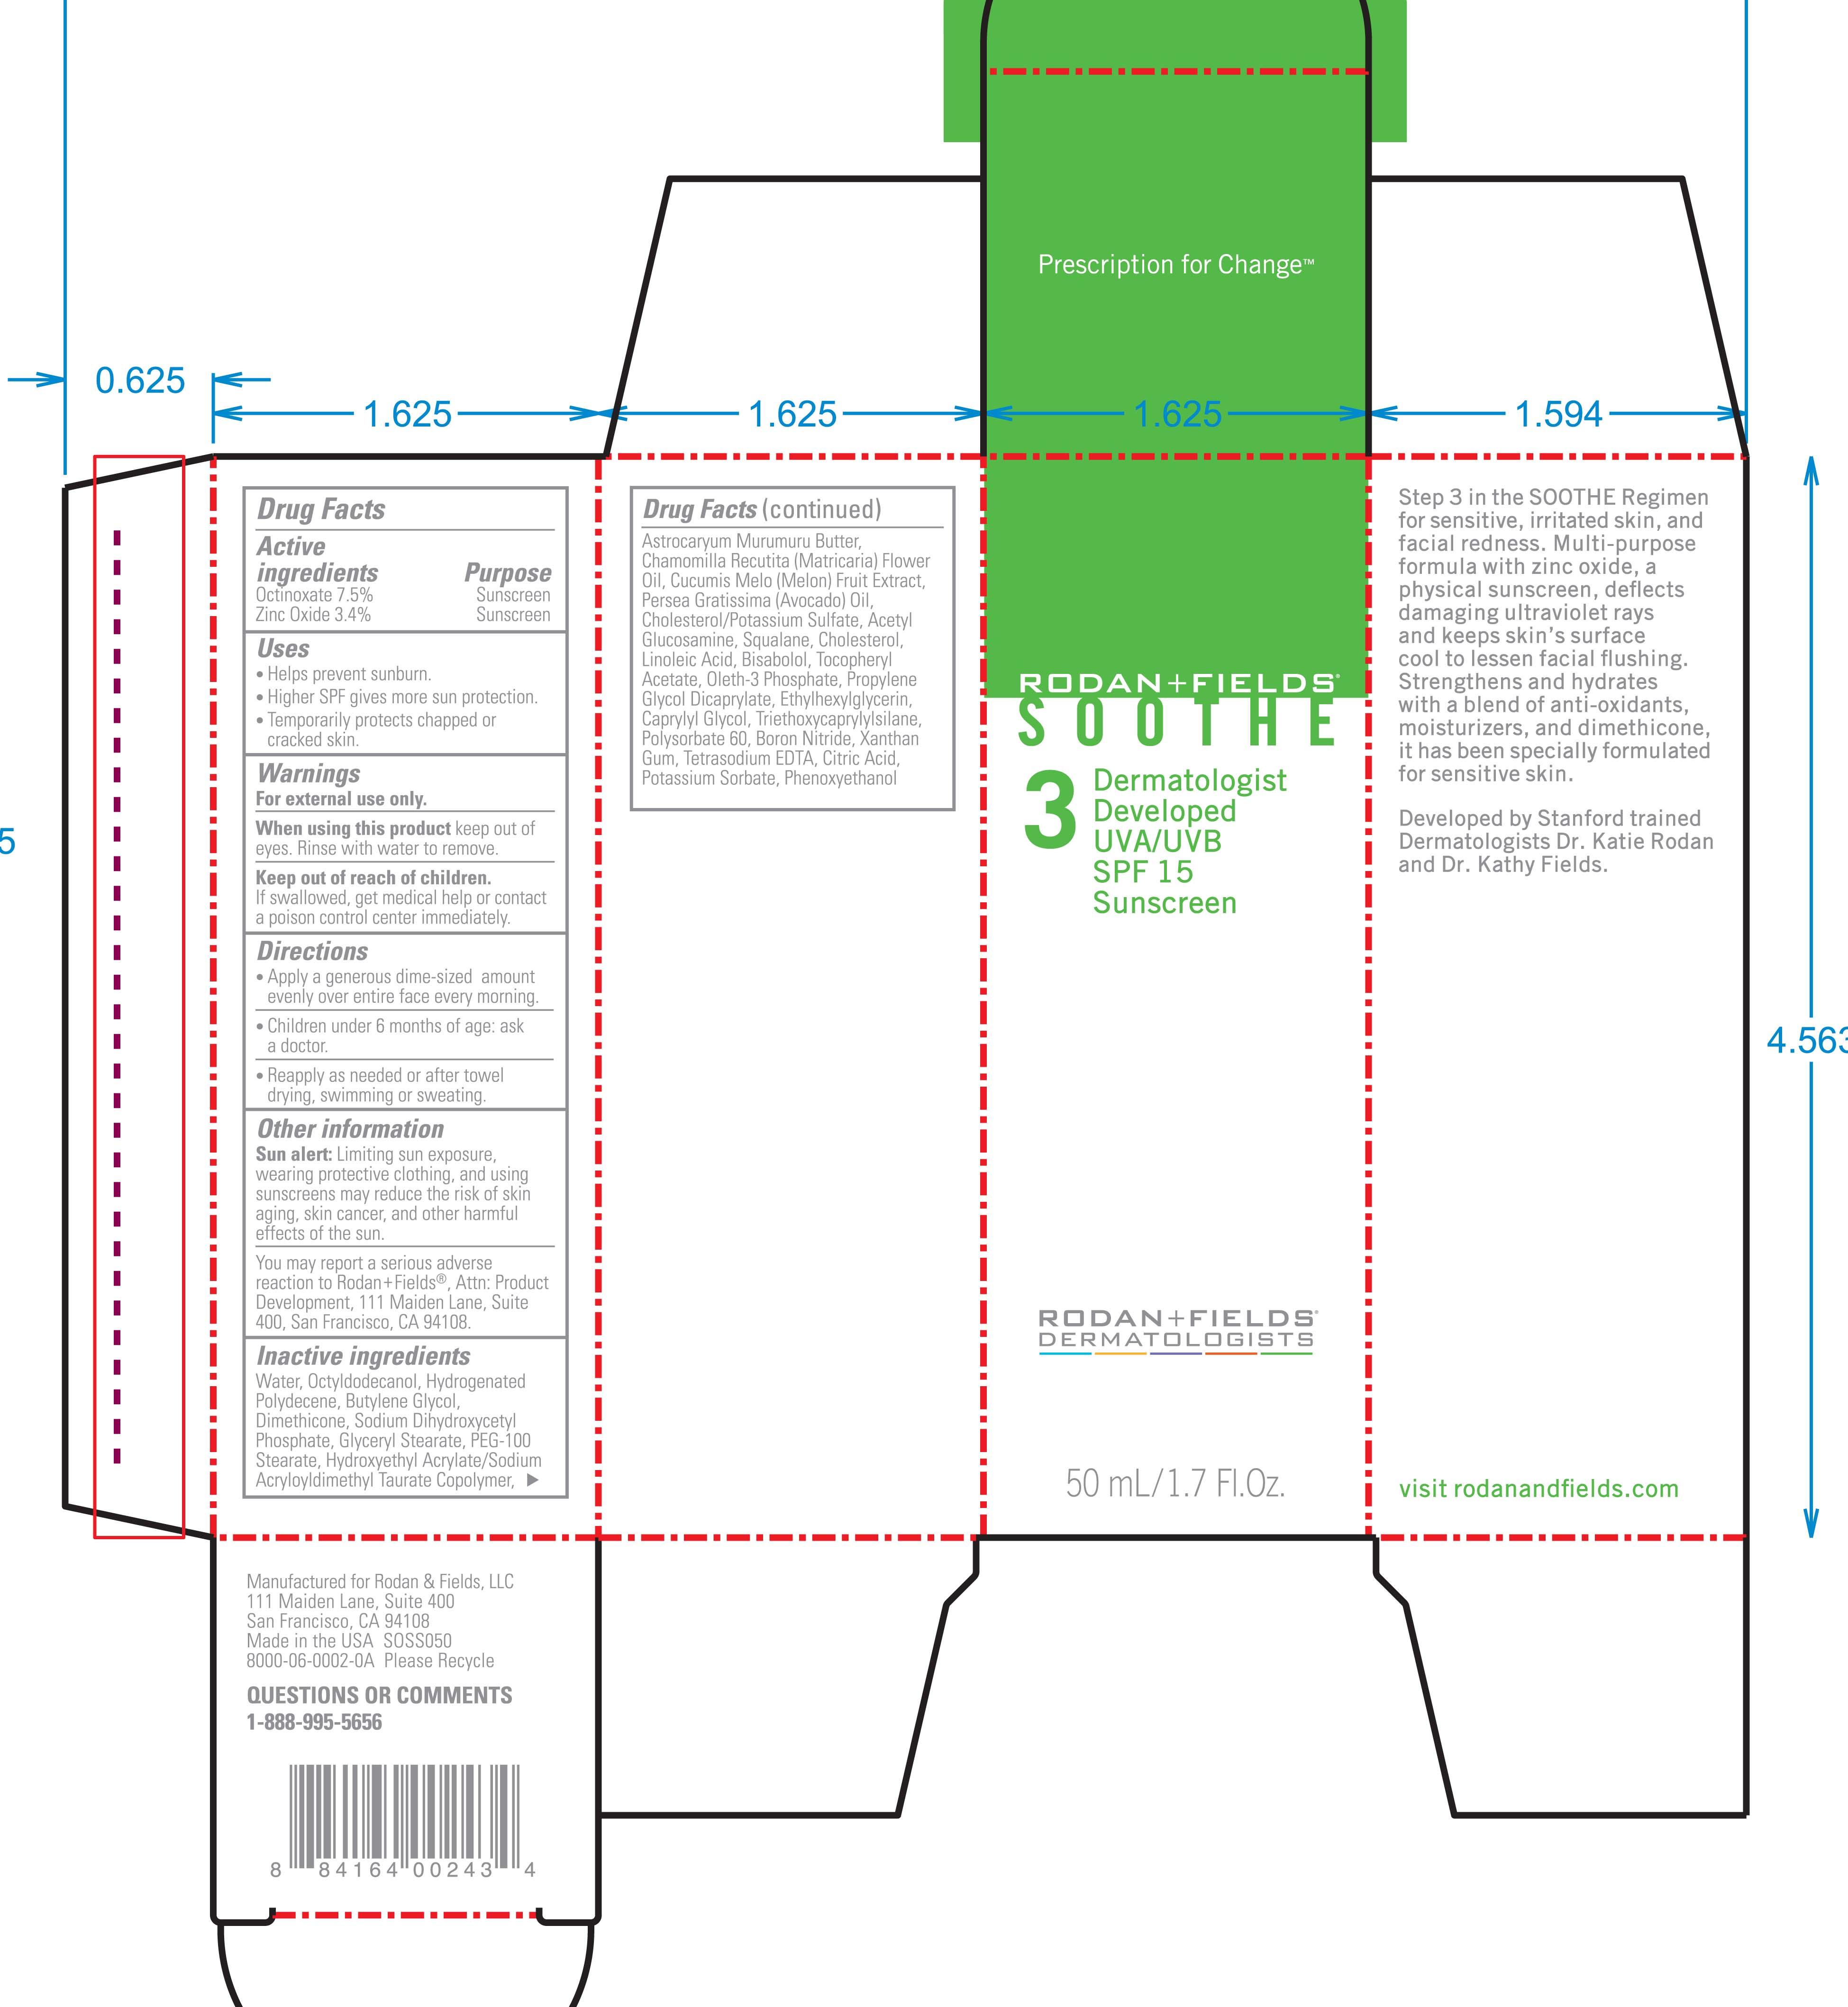 image of box label